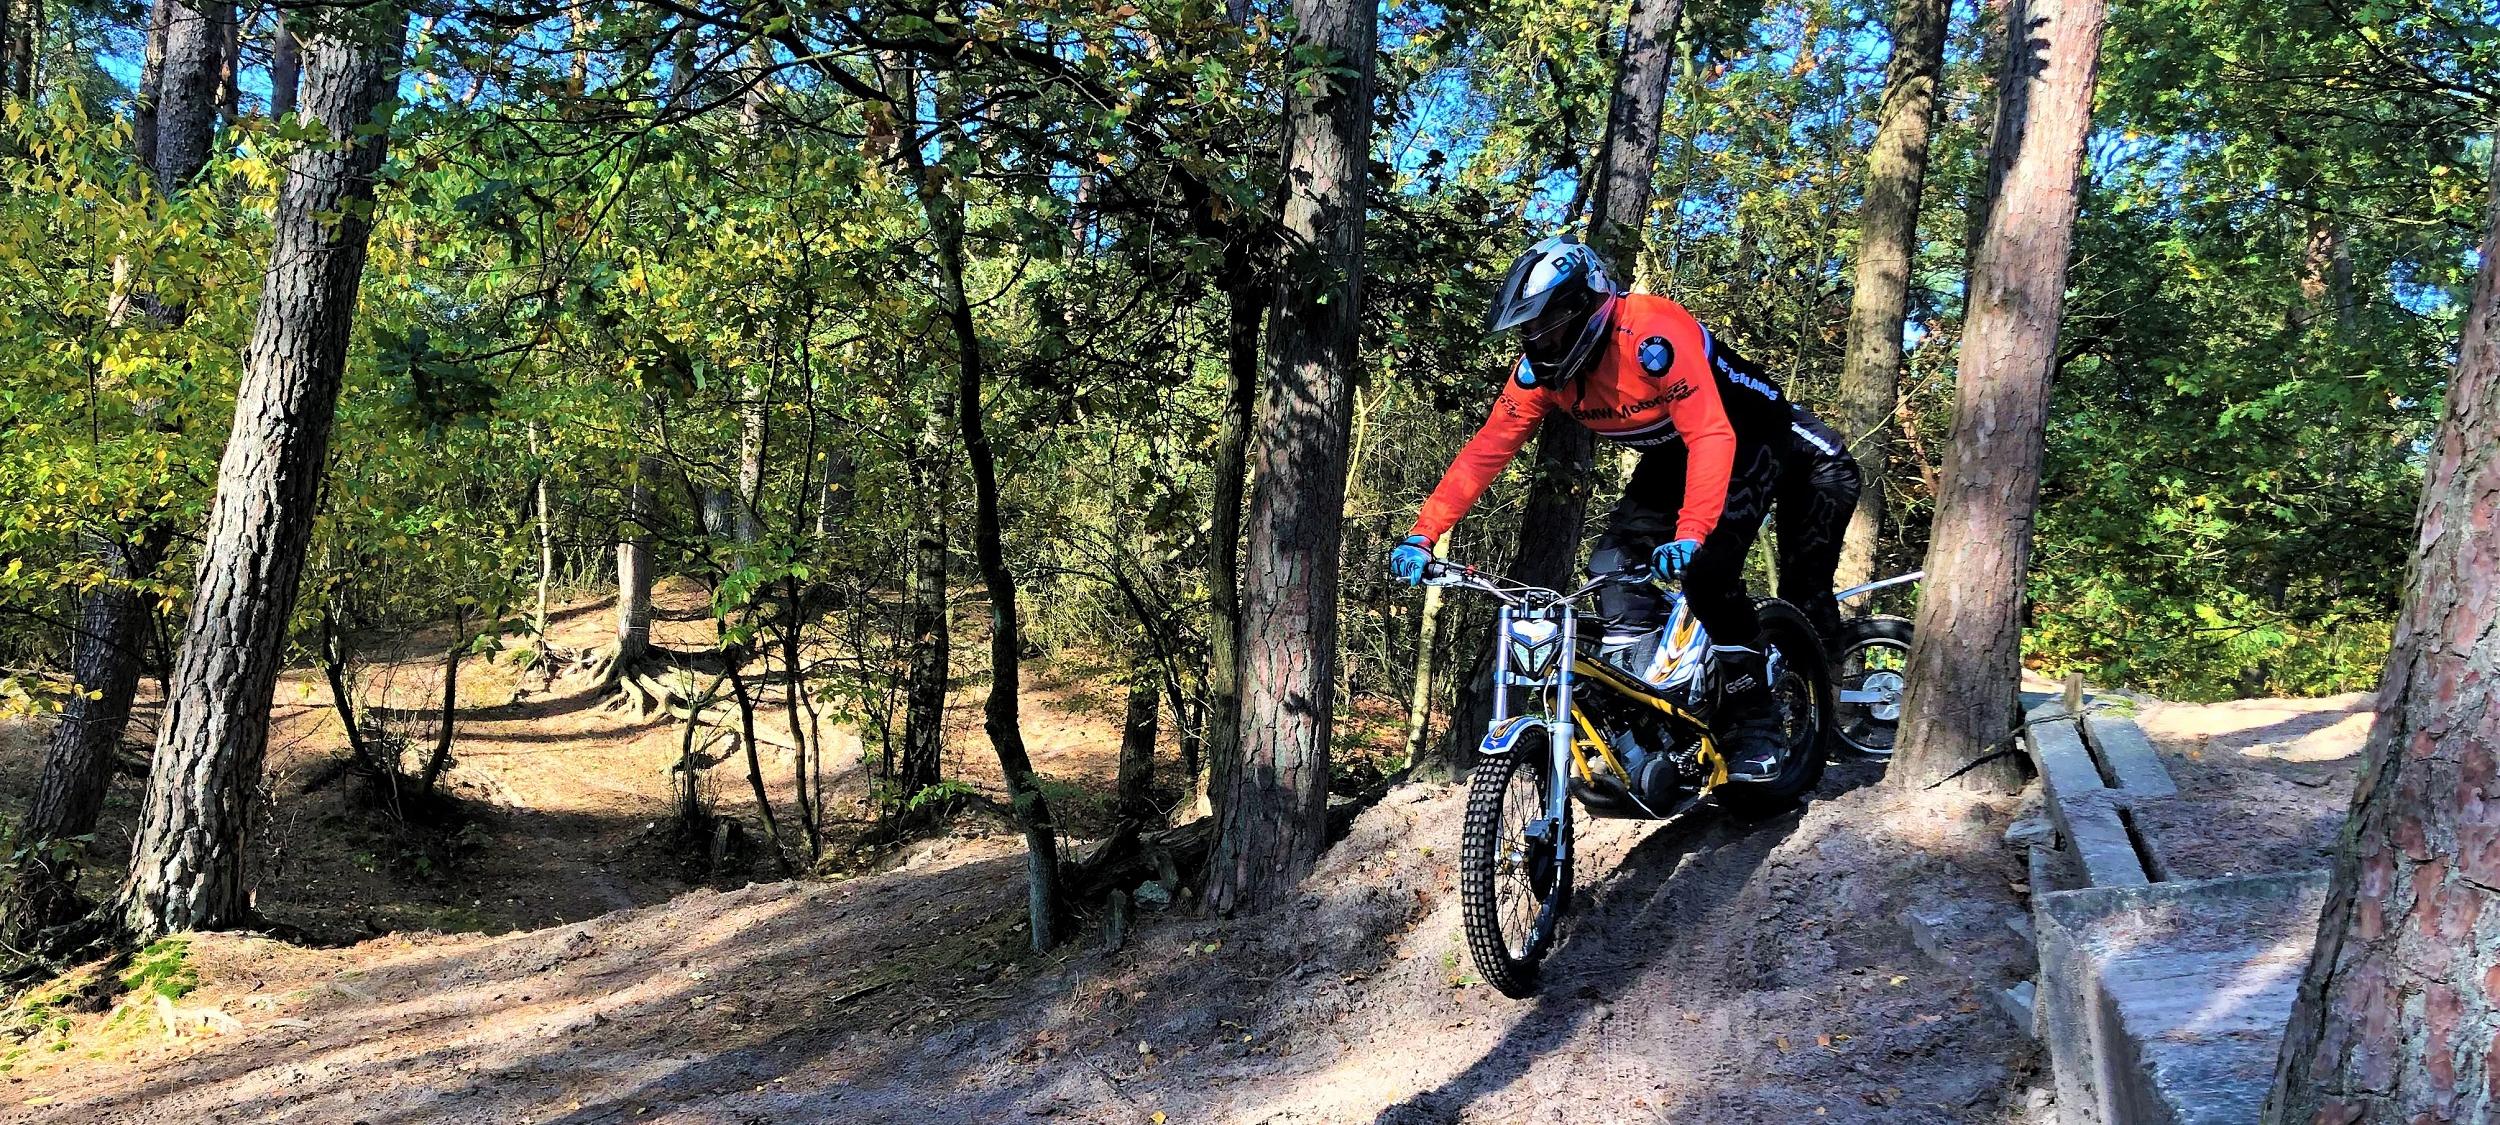 GS Adventure Trial training offroad bij BERRT slider